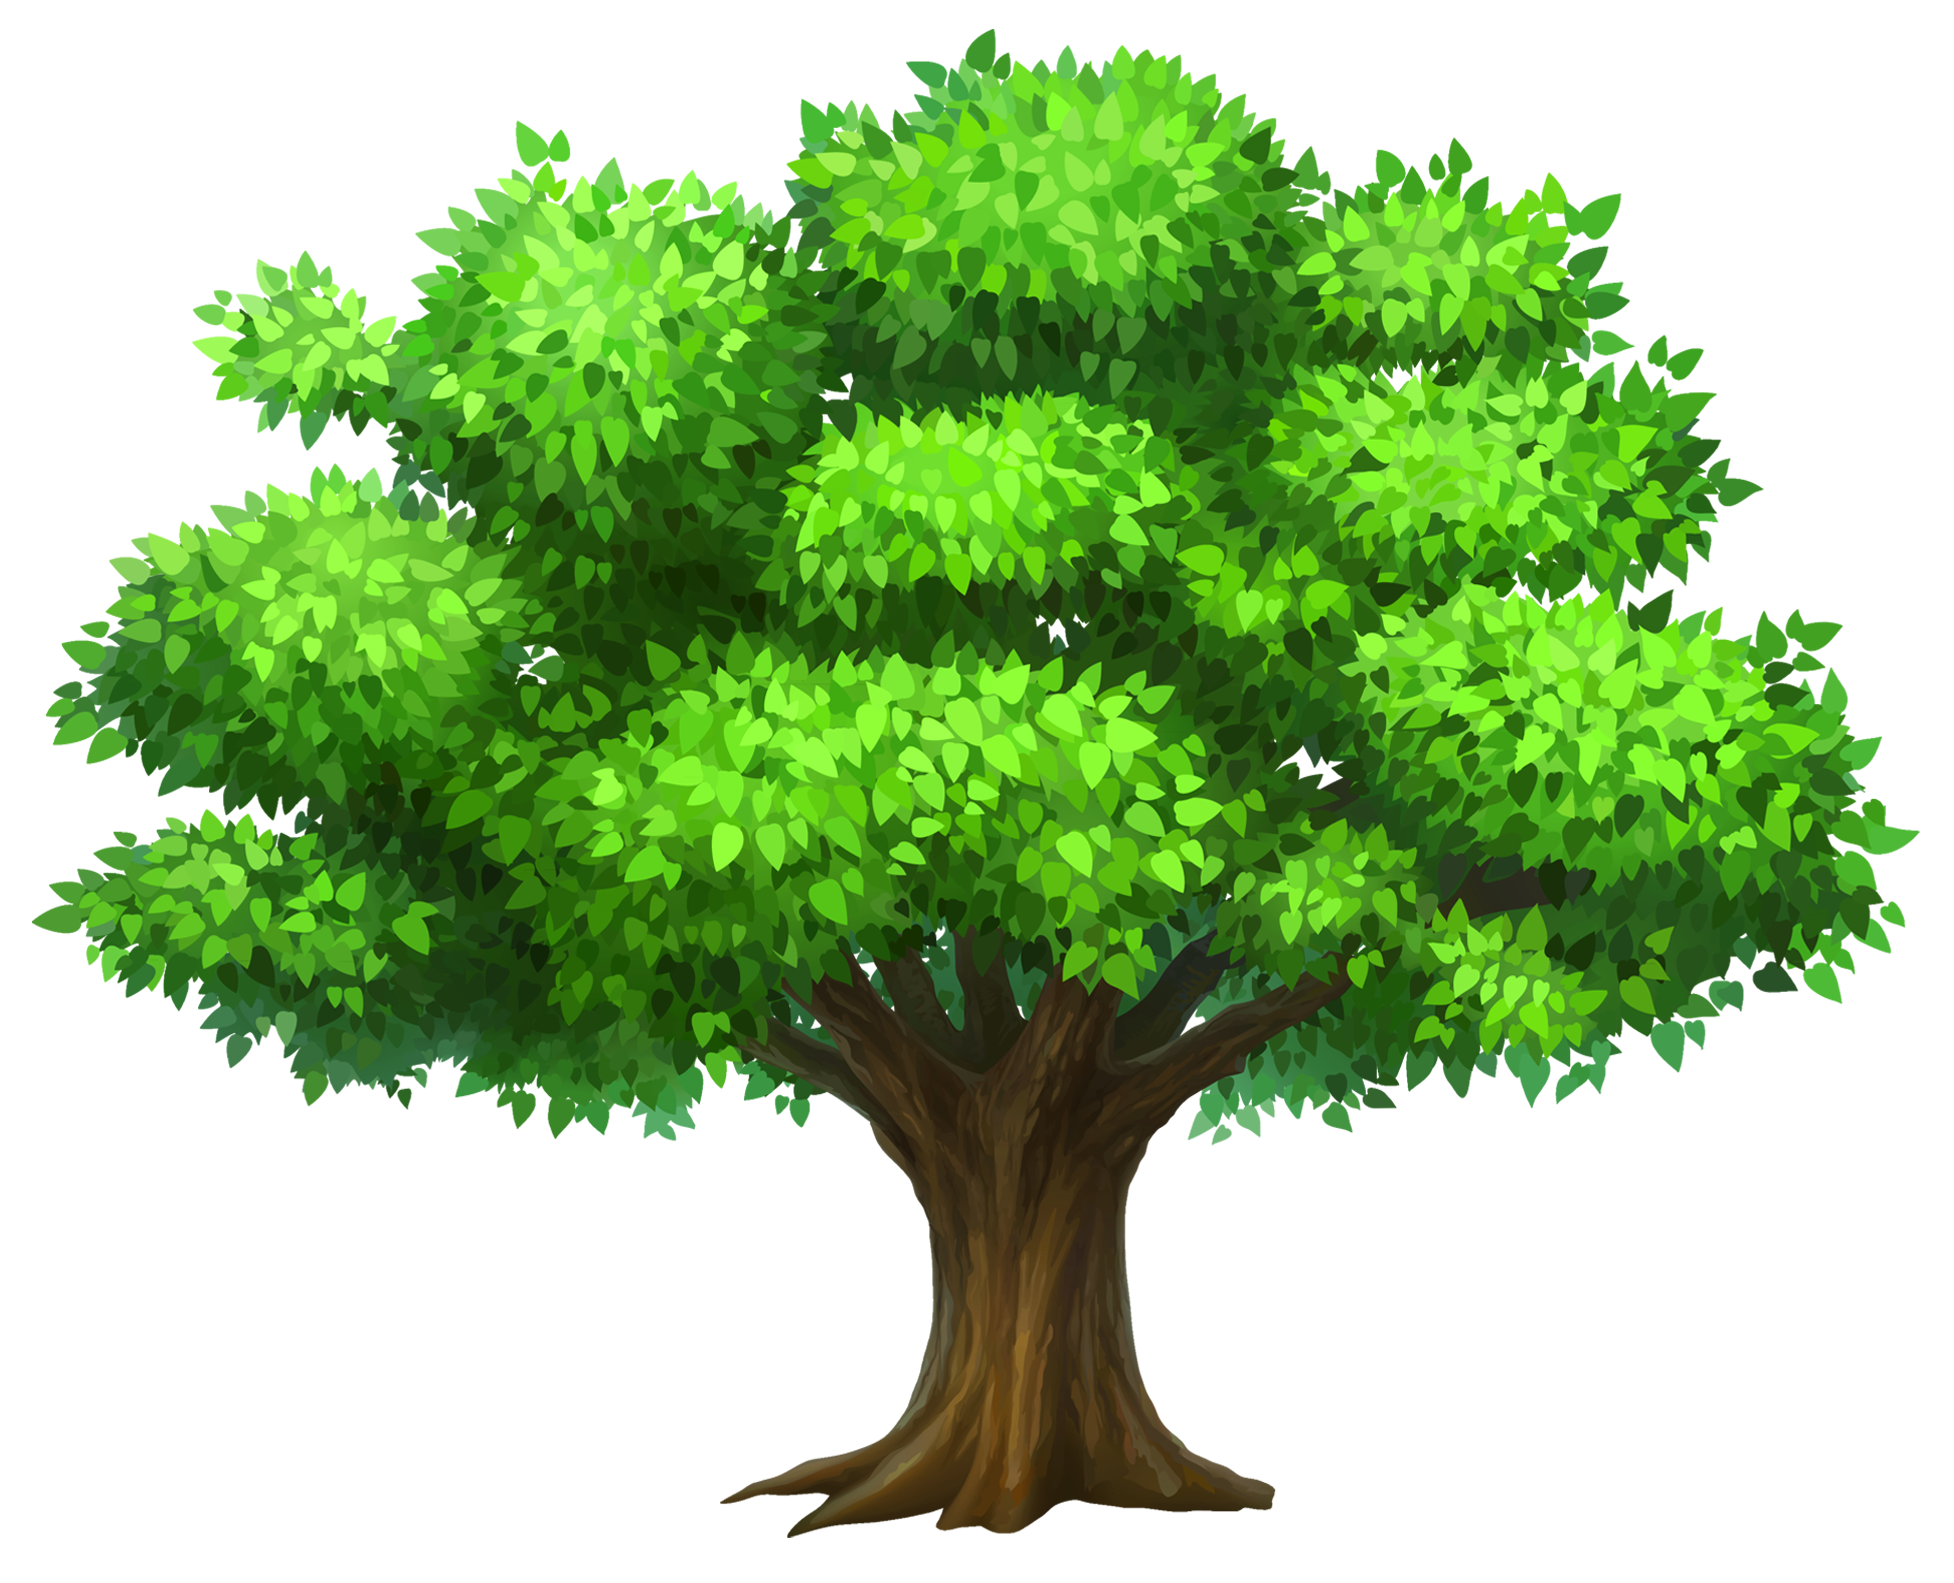 Want to Feel Like A Million Bucks? Plant 100 Trees!